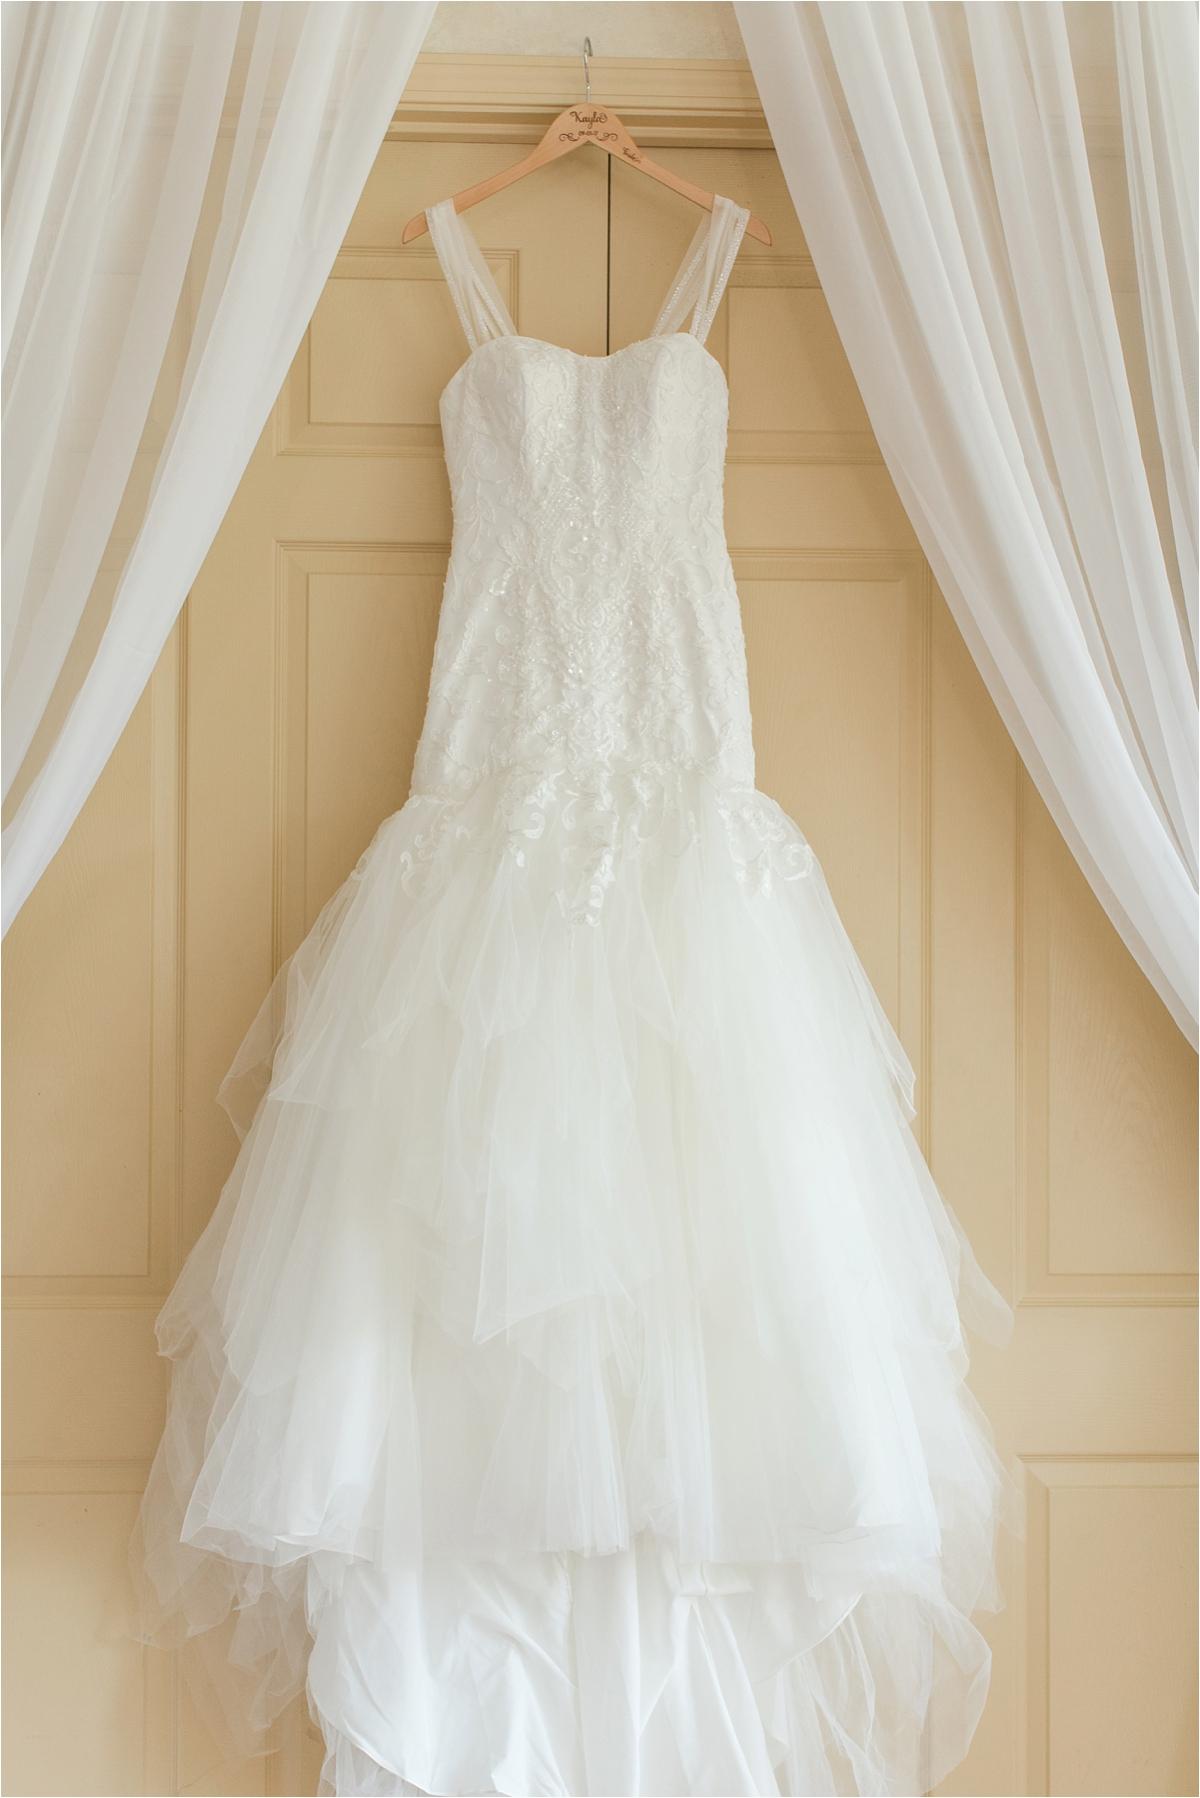 tule-wedding-dress-skirt-mermaid-fit-lace-detailing-layered-skirt